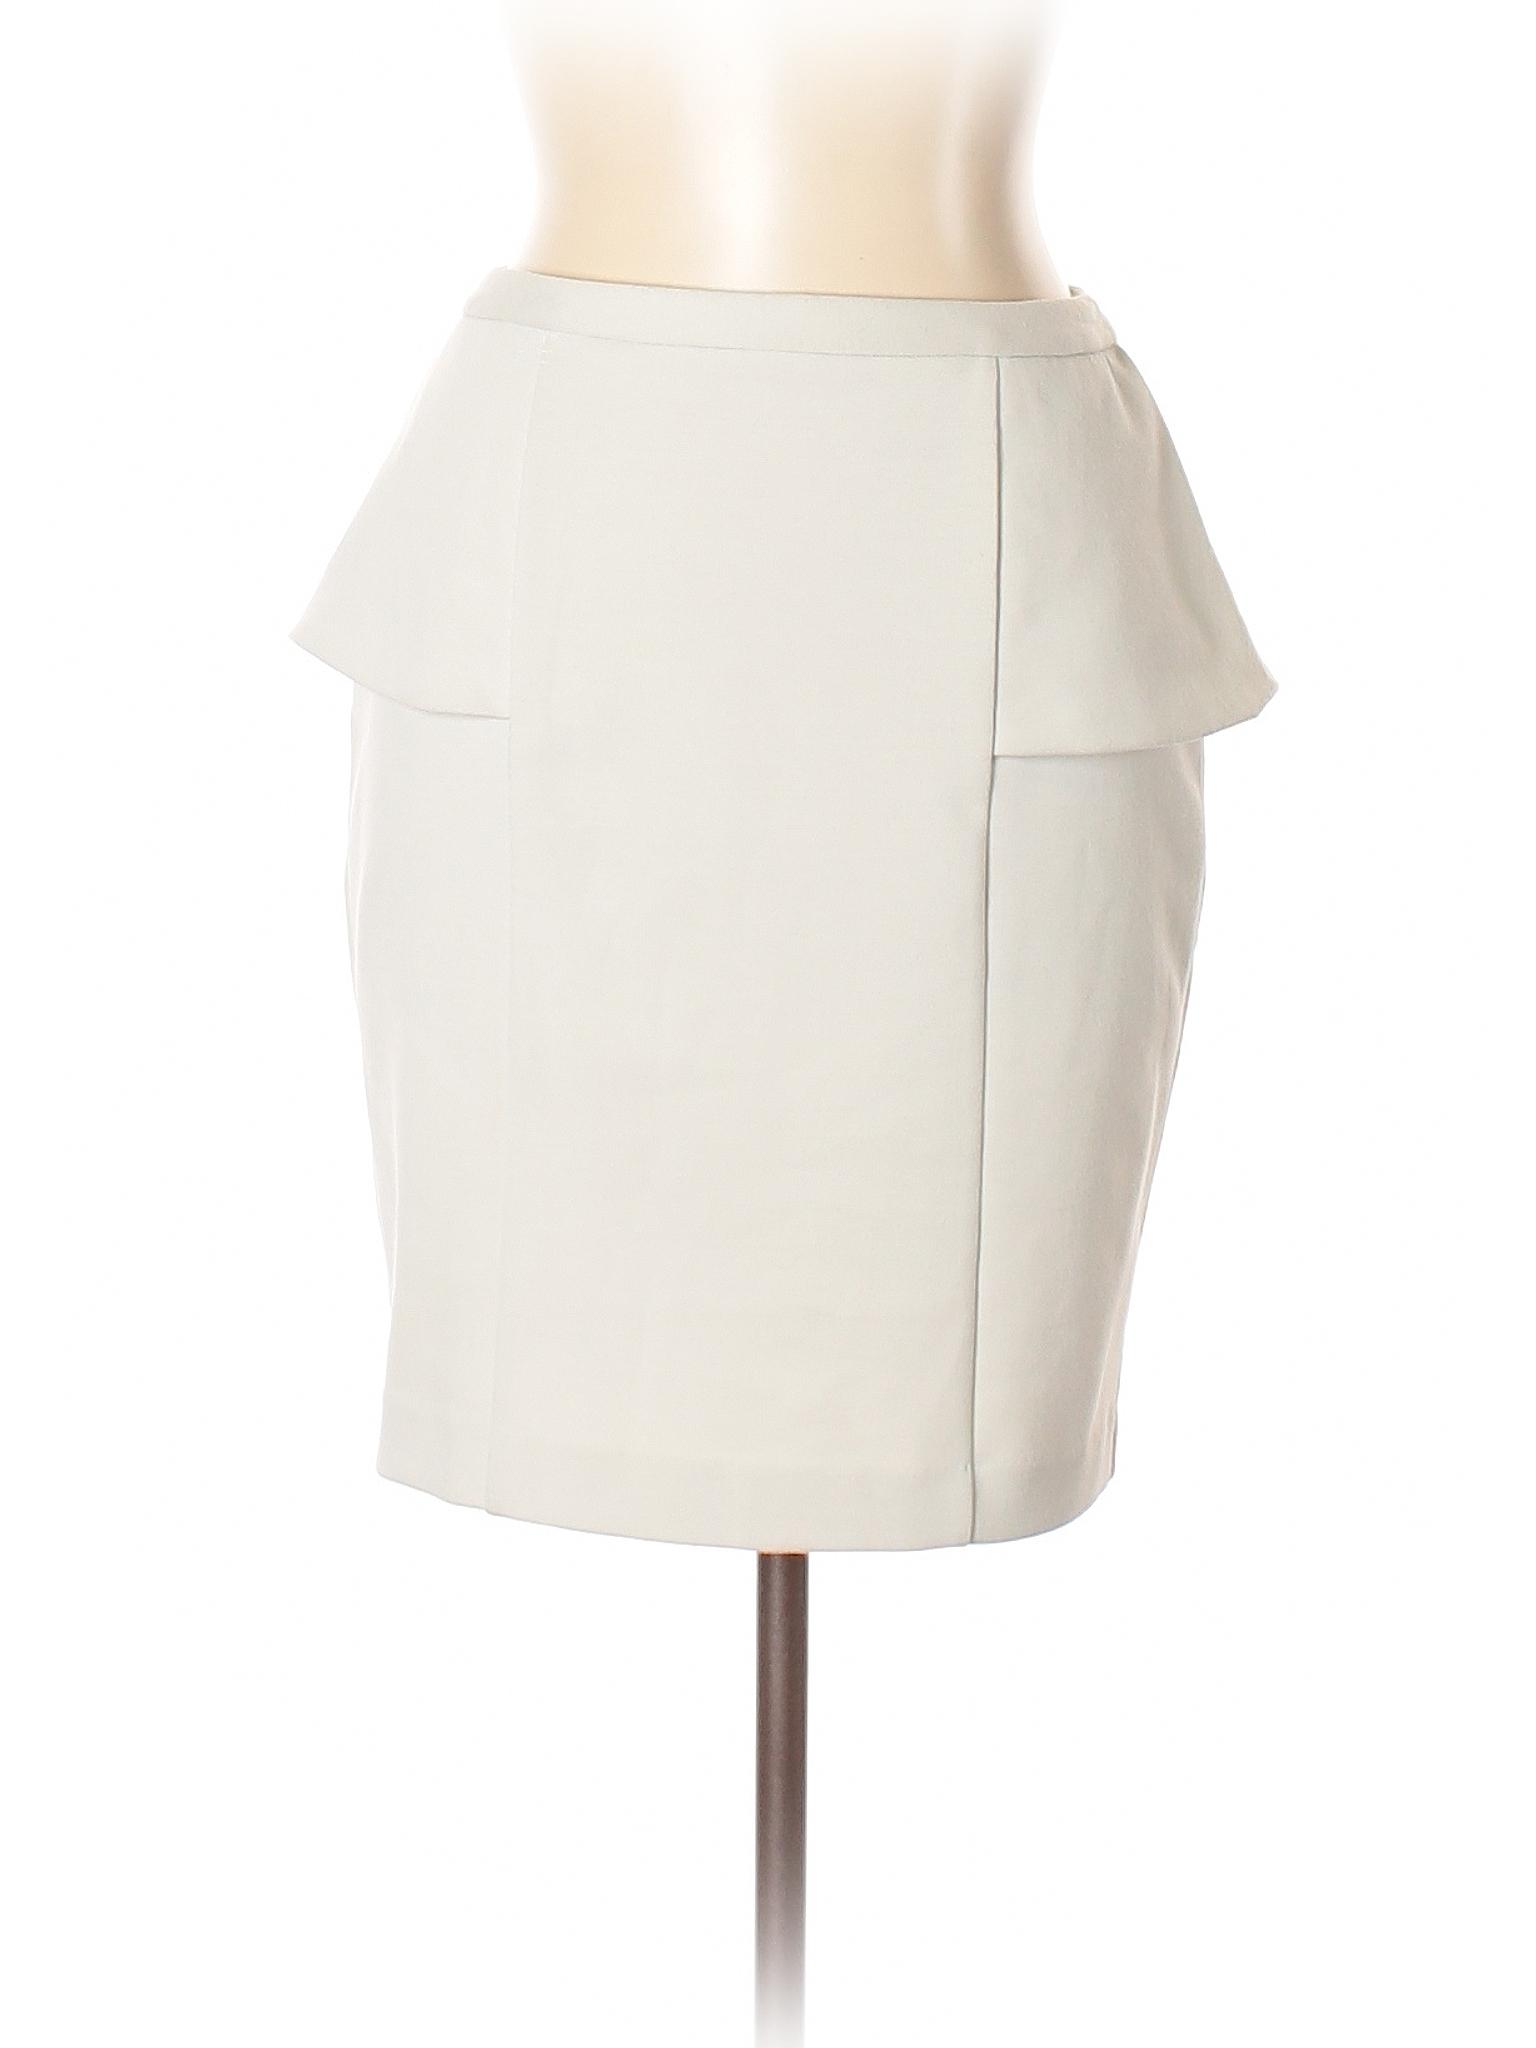 Skirt Boutique Casual Skirt Skirt Casual Casual Boutique Casual Boutique Skirt Casual Skirt Boutique Boutique Boutique f05q6